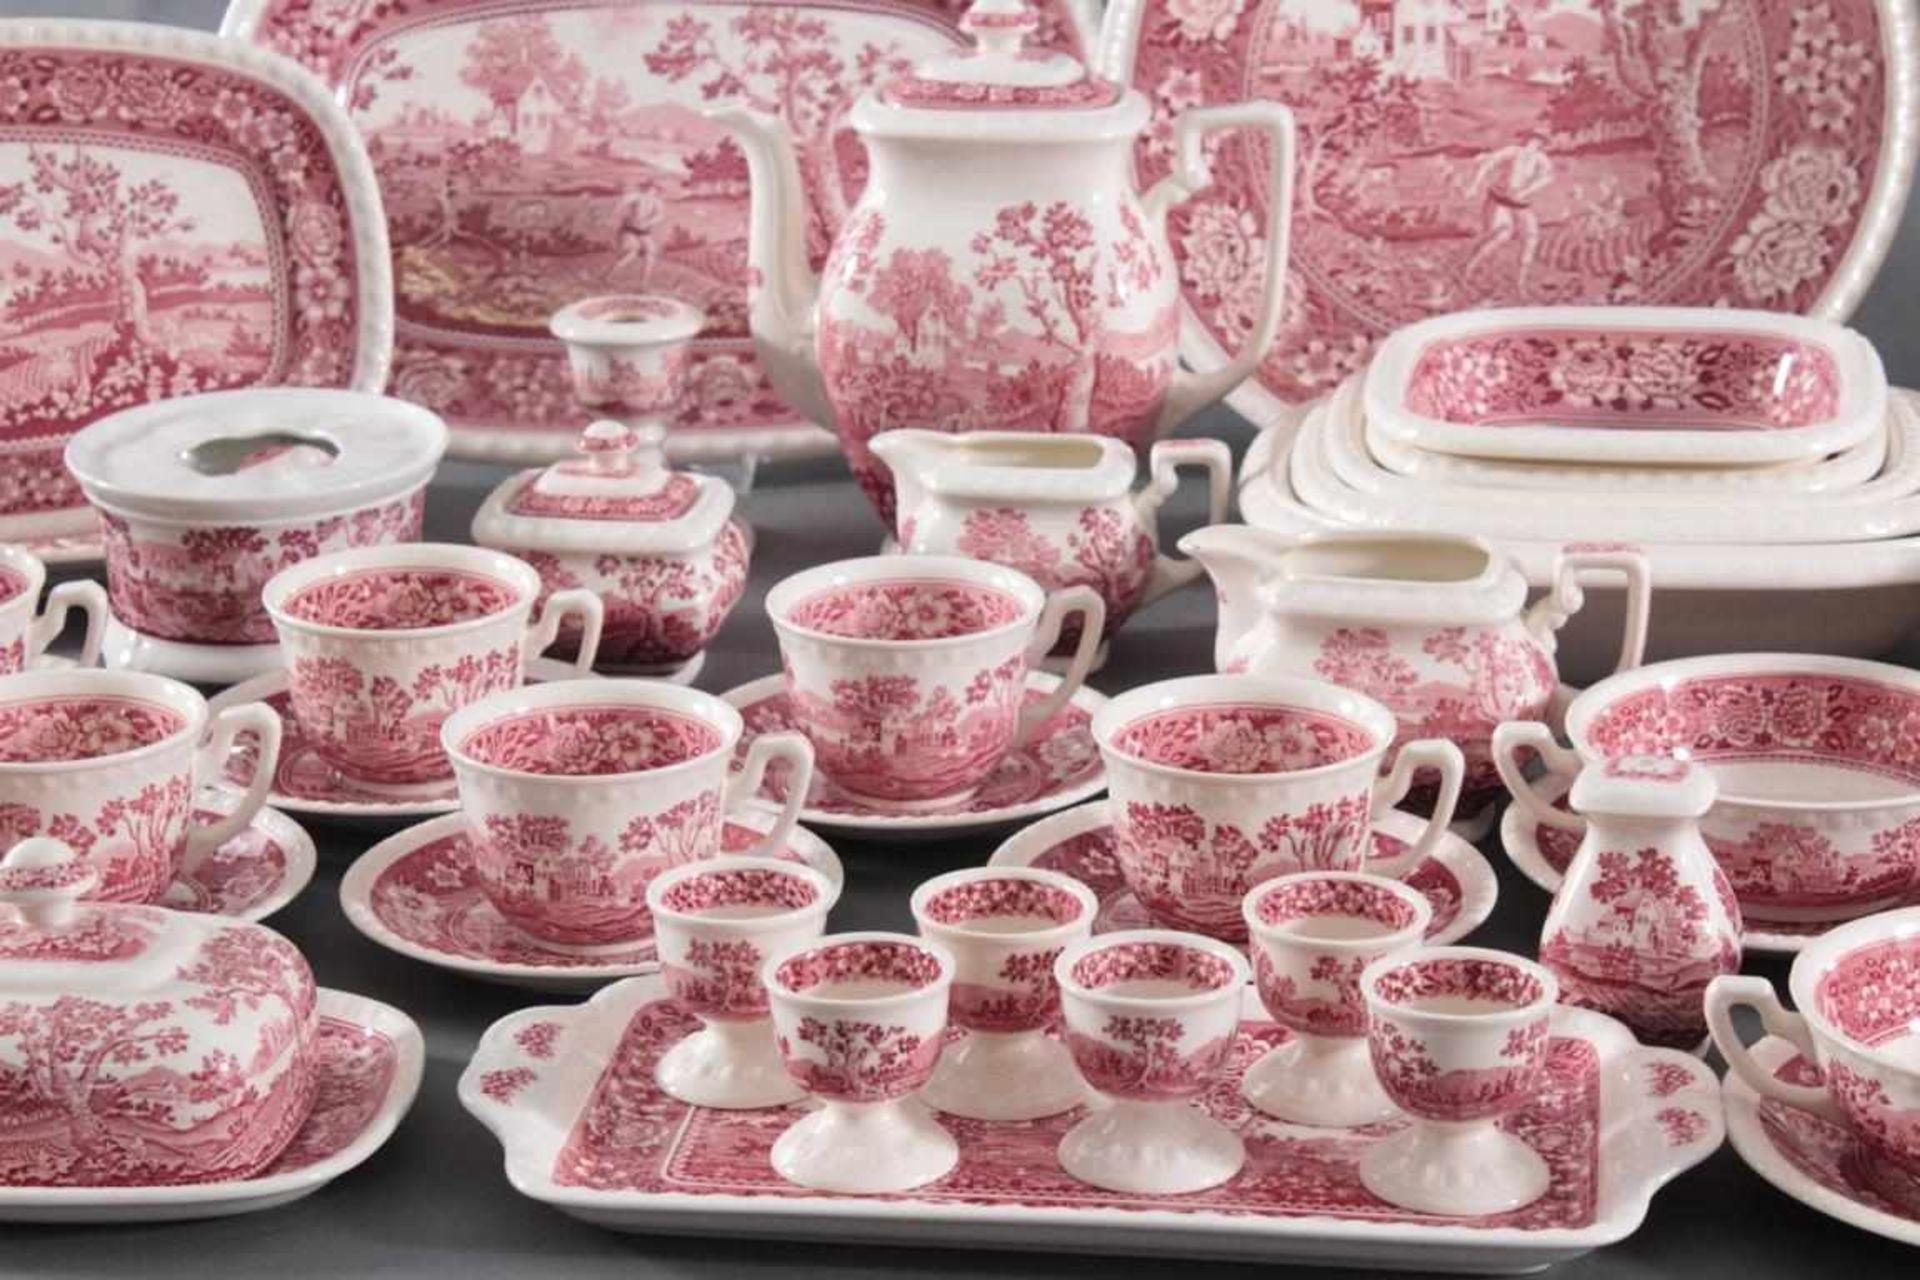 Villeroy & Boch Kaffee-/Speiseservice, Dekor Rusticana rot107 Teile. 1 Kaffeekanne, 13 Tassen, 12 - Bild 2 aus 4